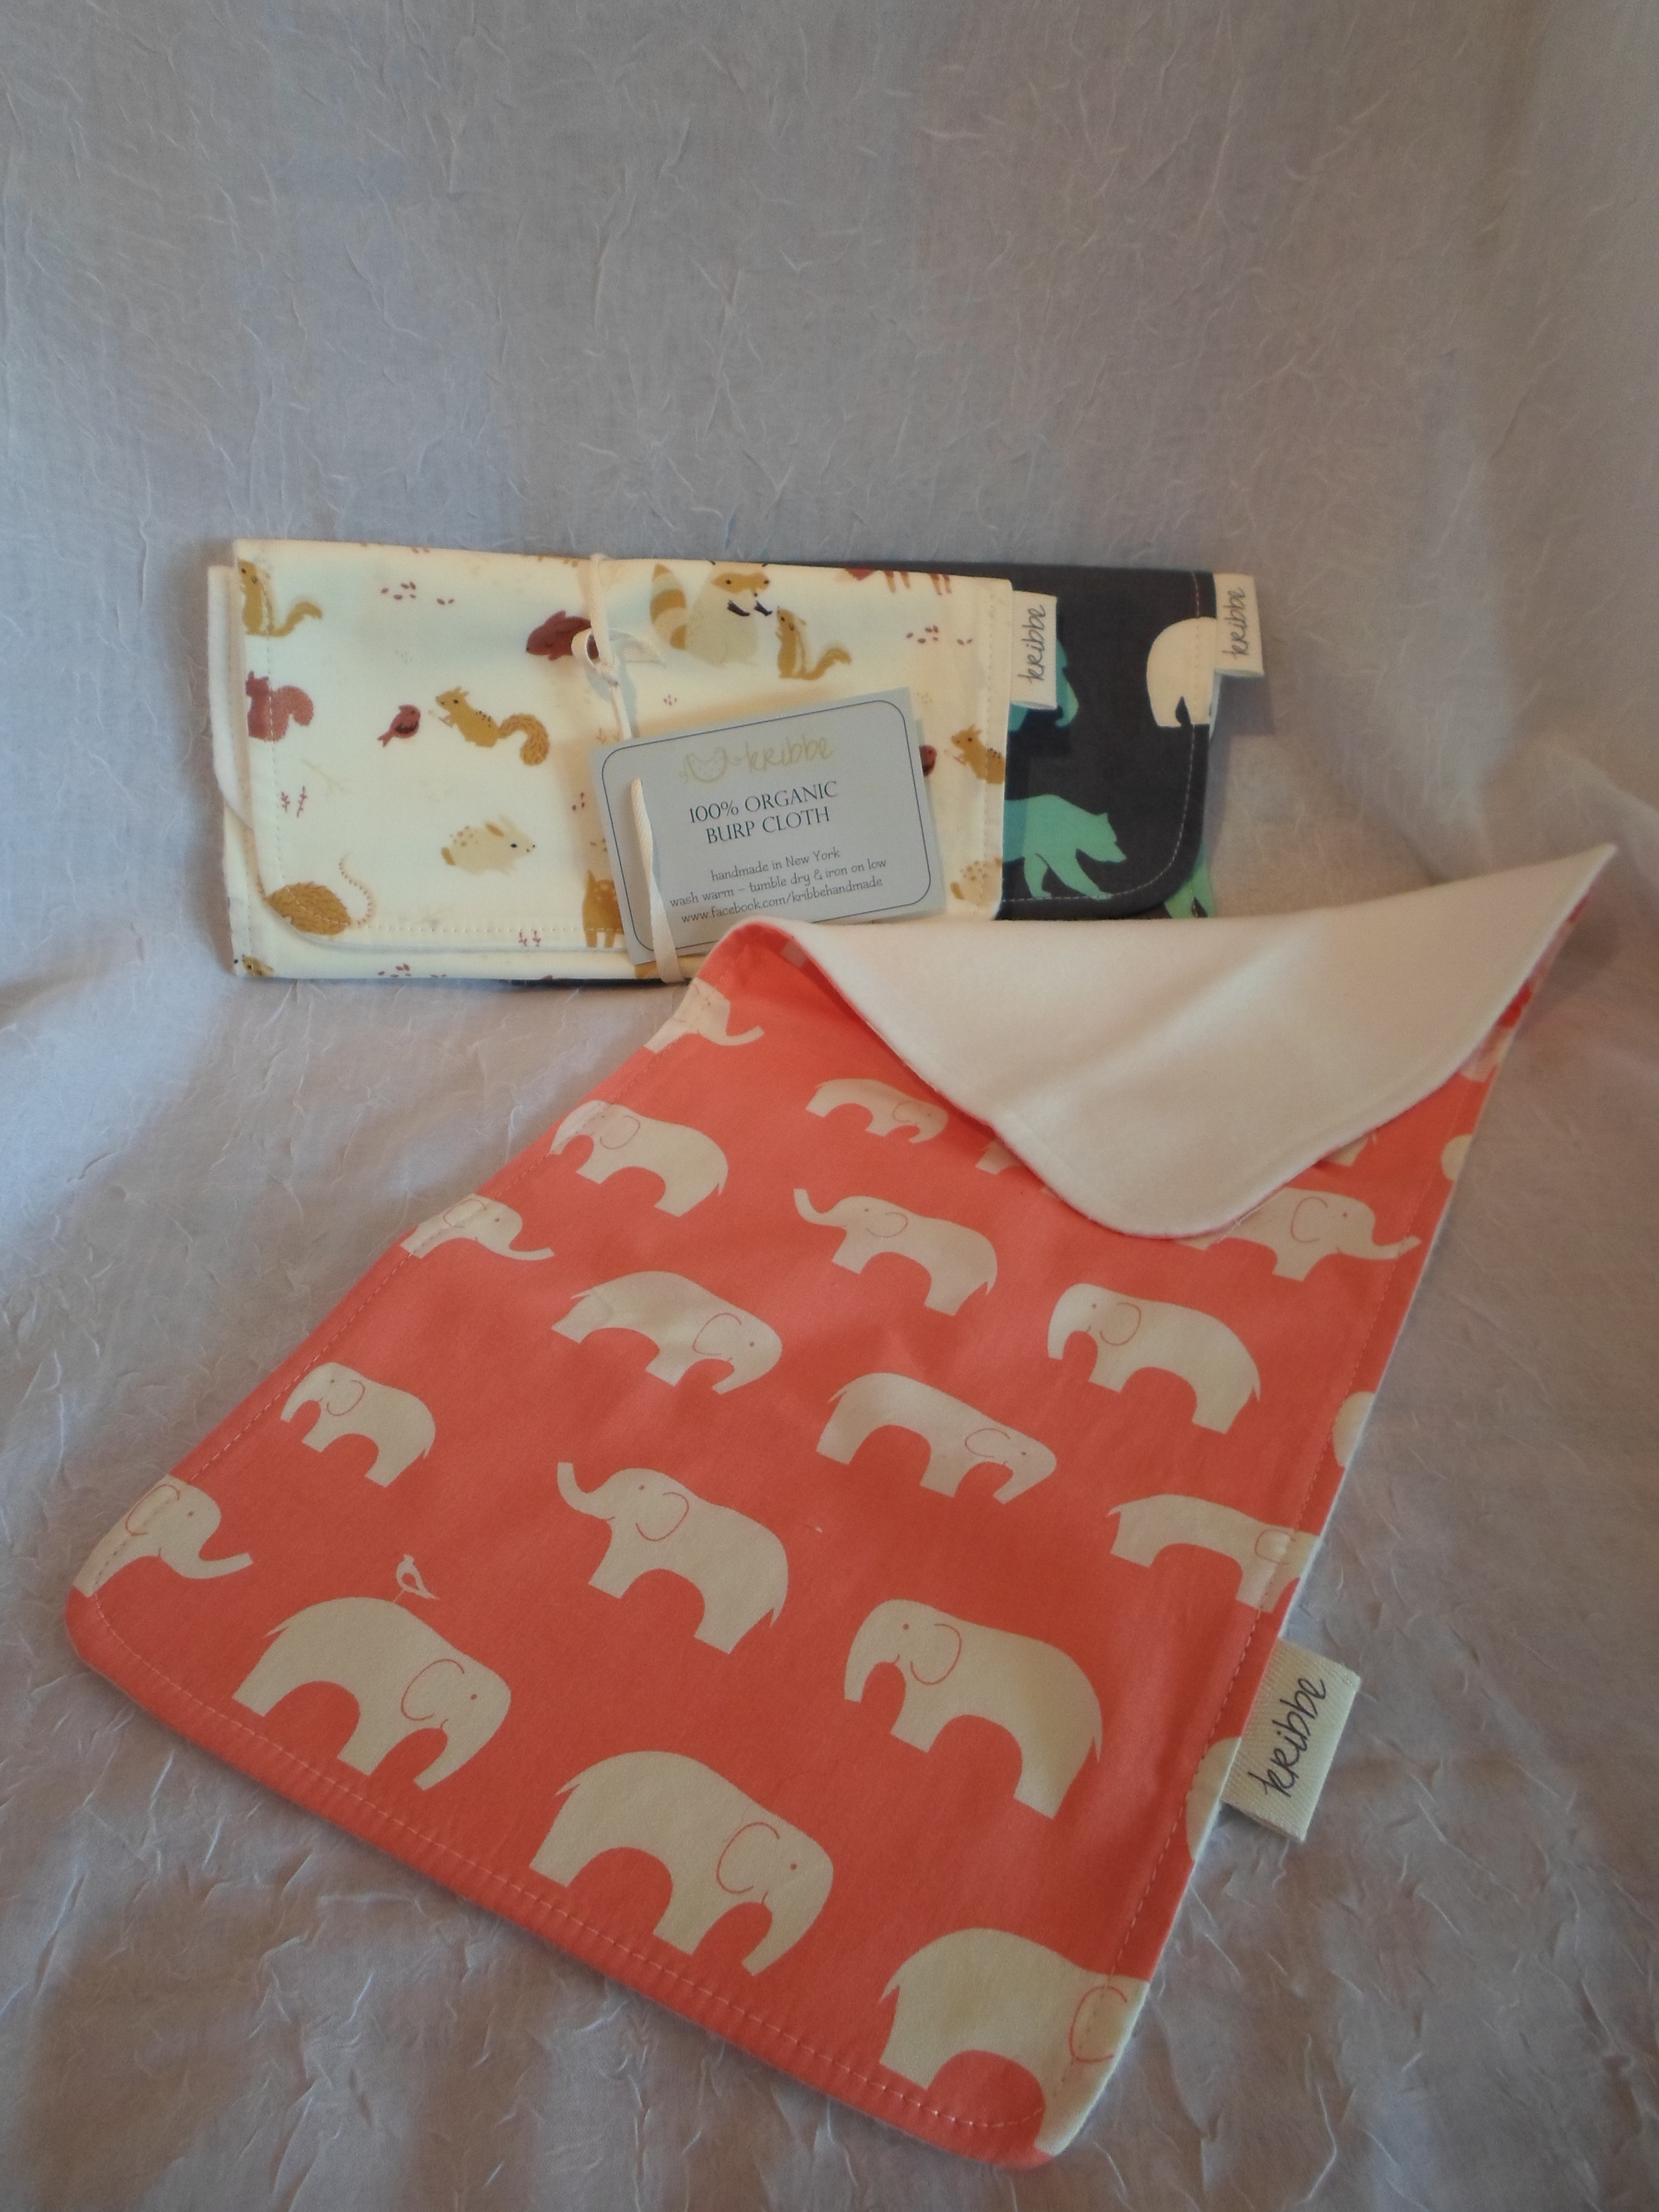 Kribbe Organic Cotton Burps set of 3 (your choice fabric)  Locally Handmade   $39.00    Wants 1